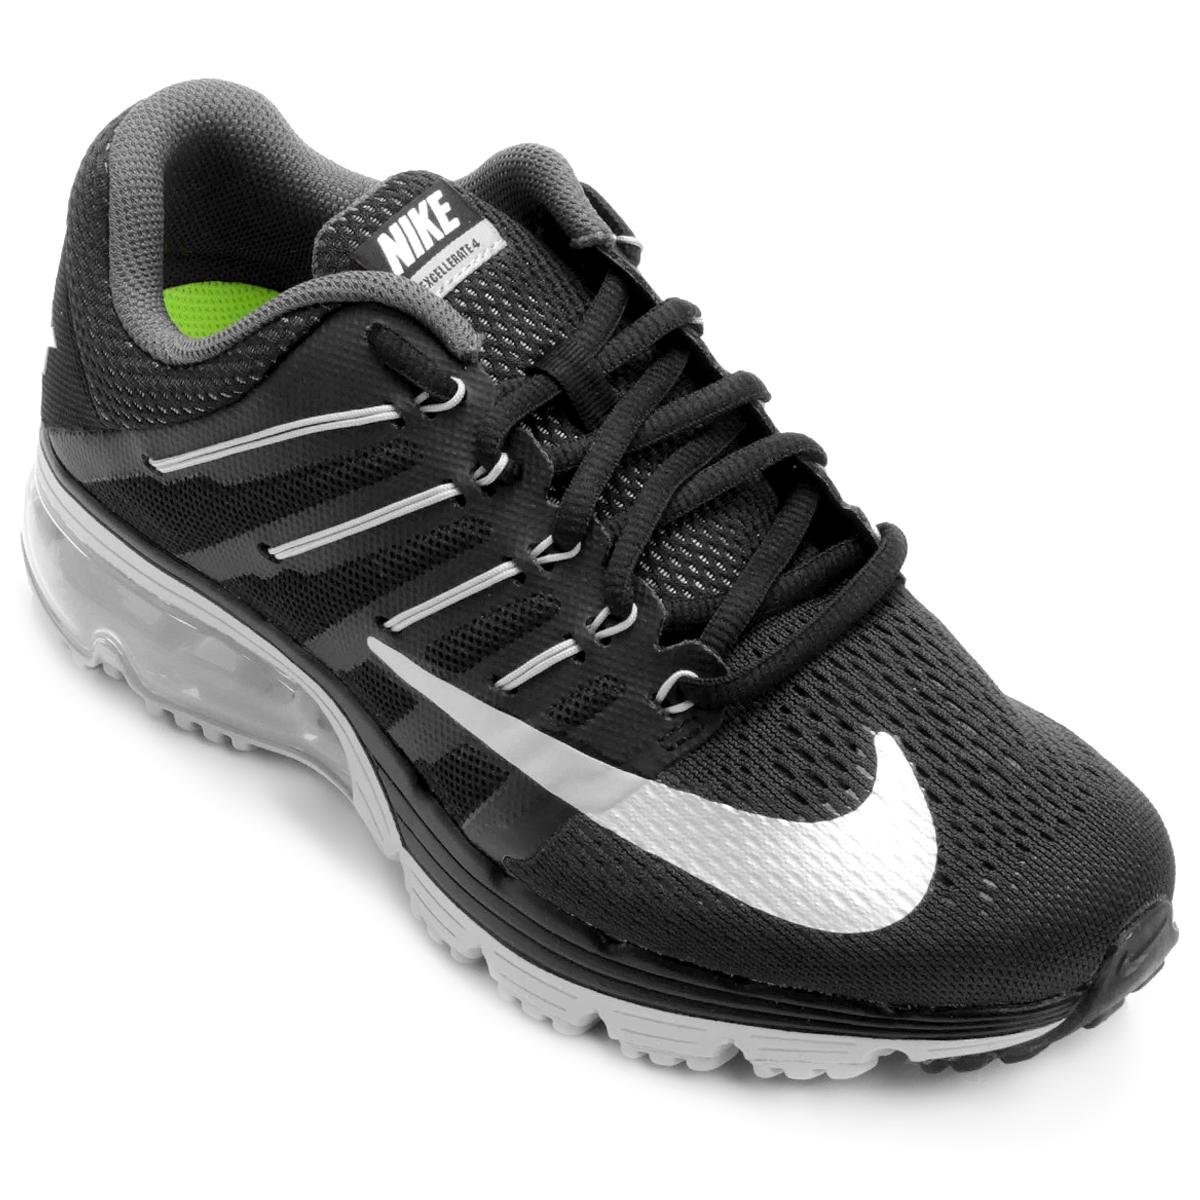 Prata Excellerate Feminino Max e 4 Tênis Nike Preto Air pq8Zwx7zP